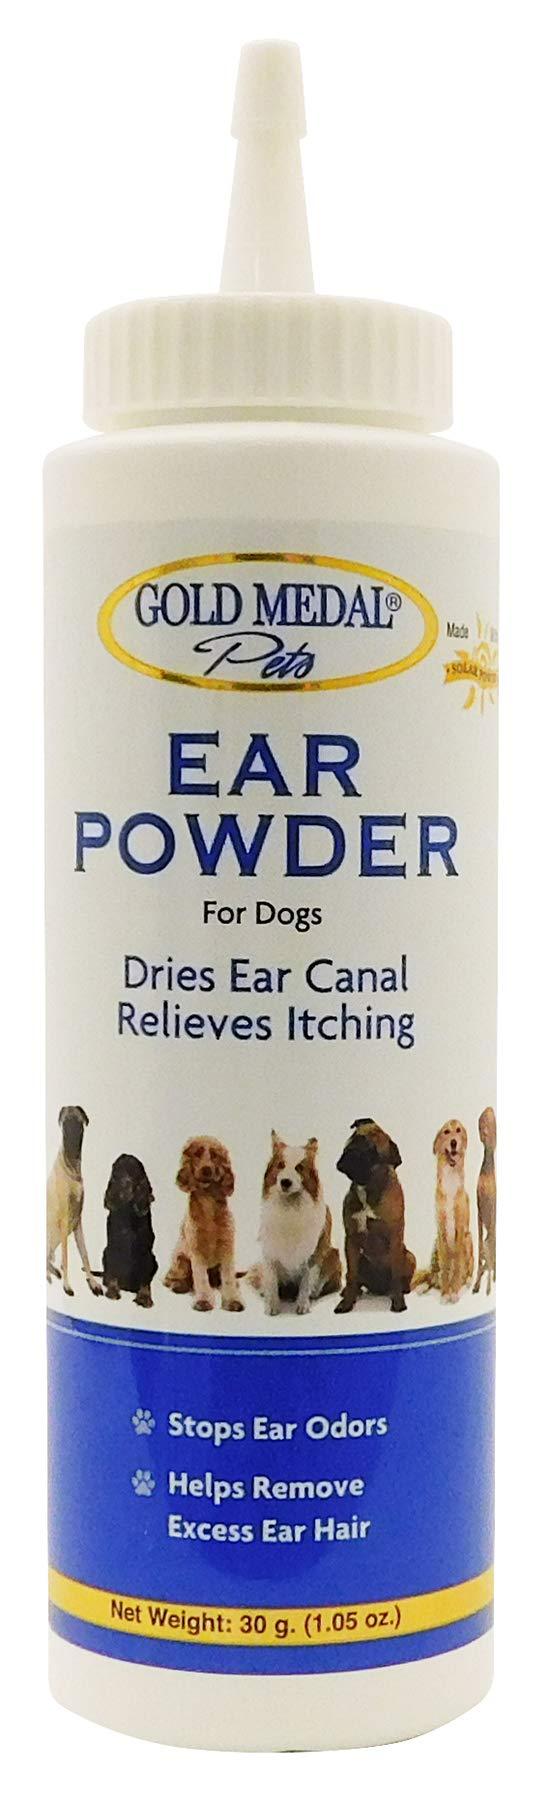 Gold Medal Groomers Ear Powder (30 Grams)